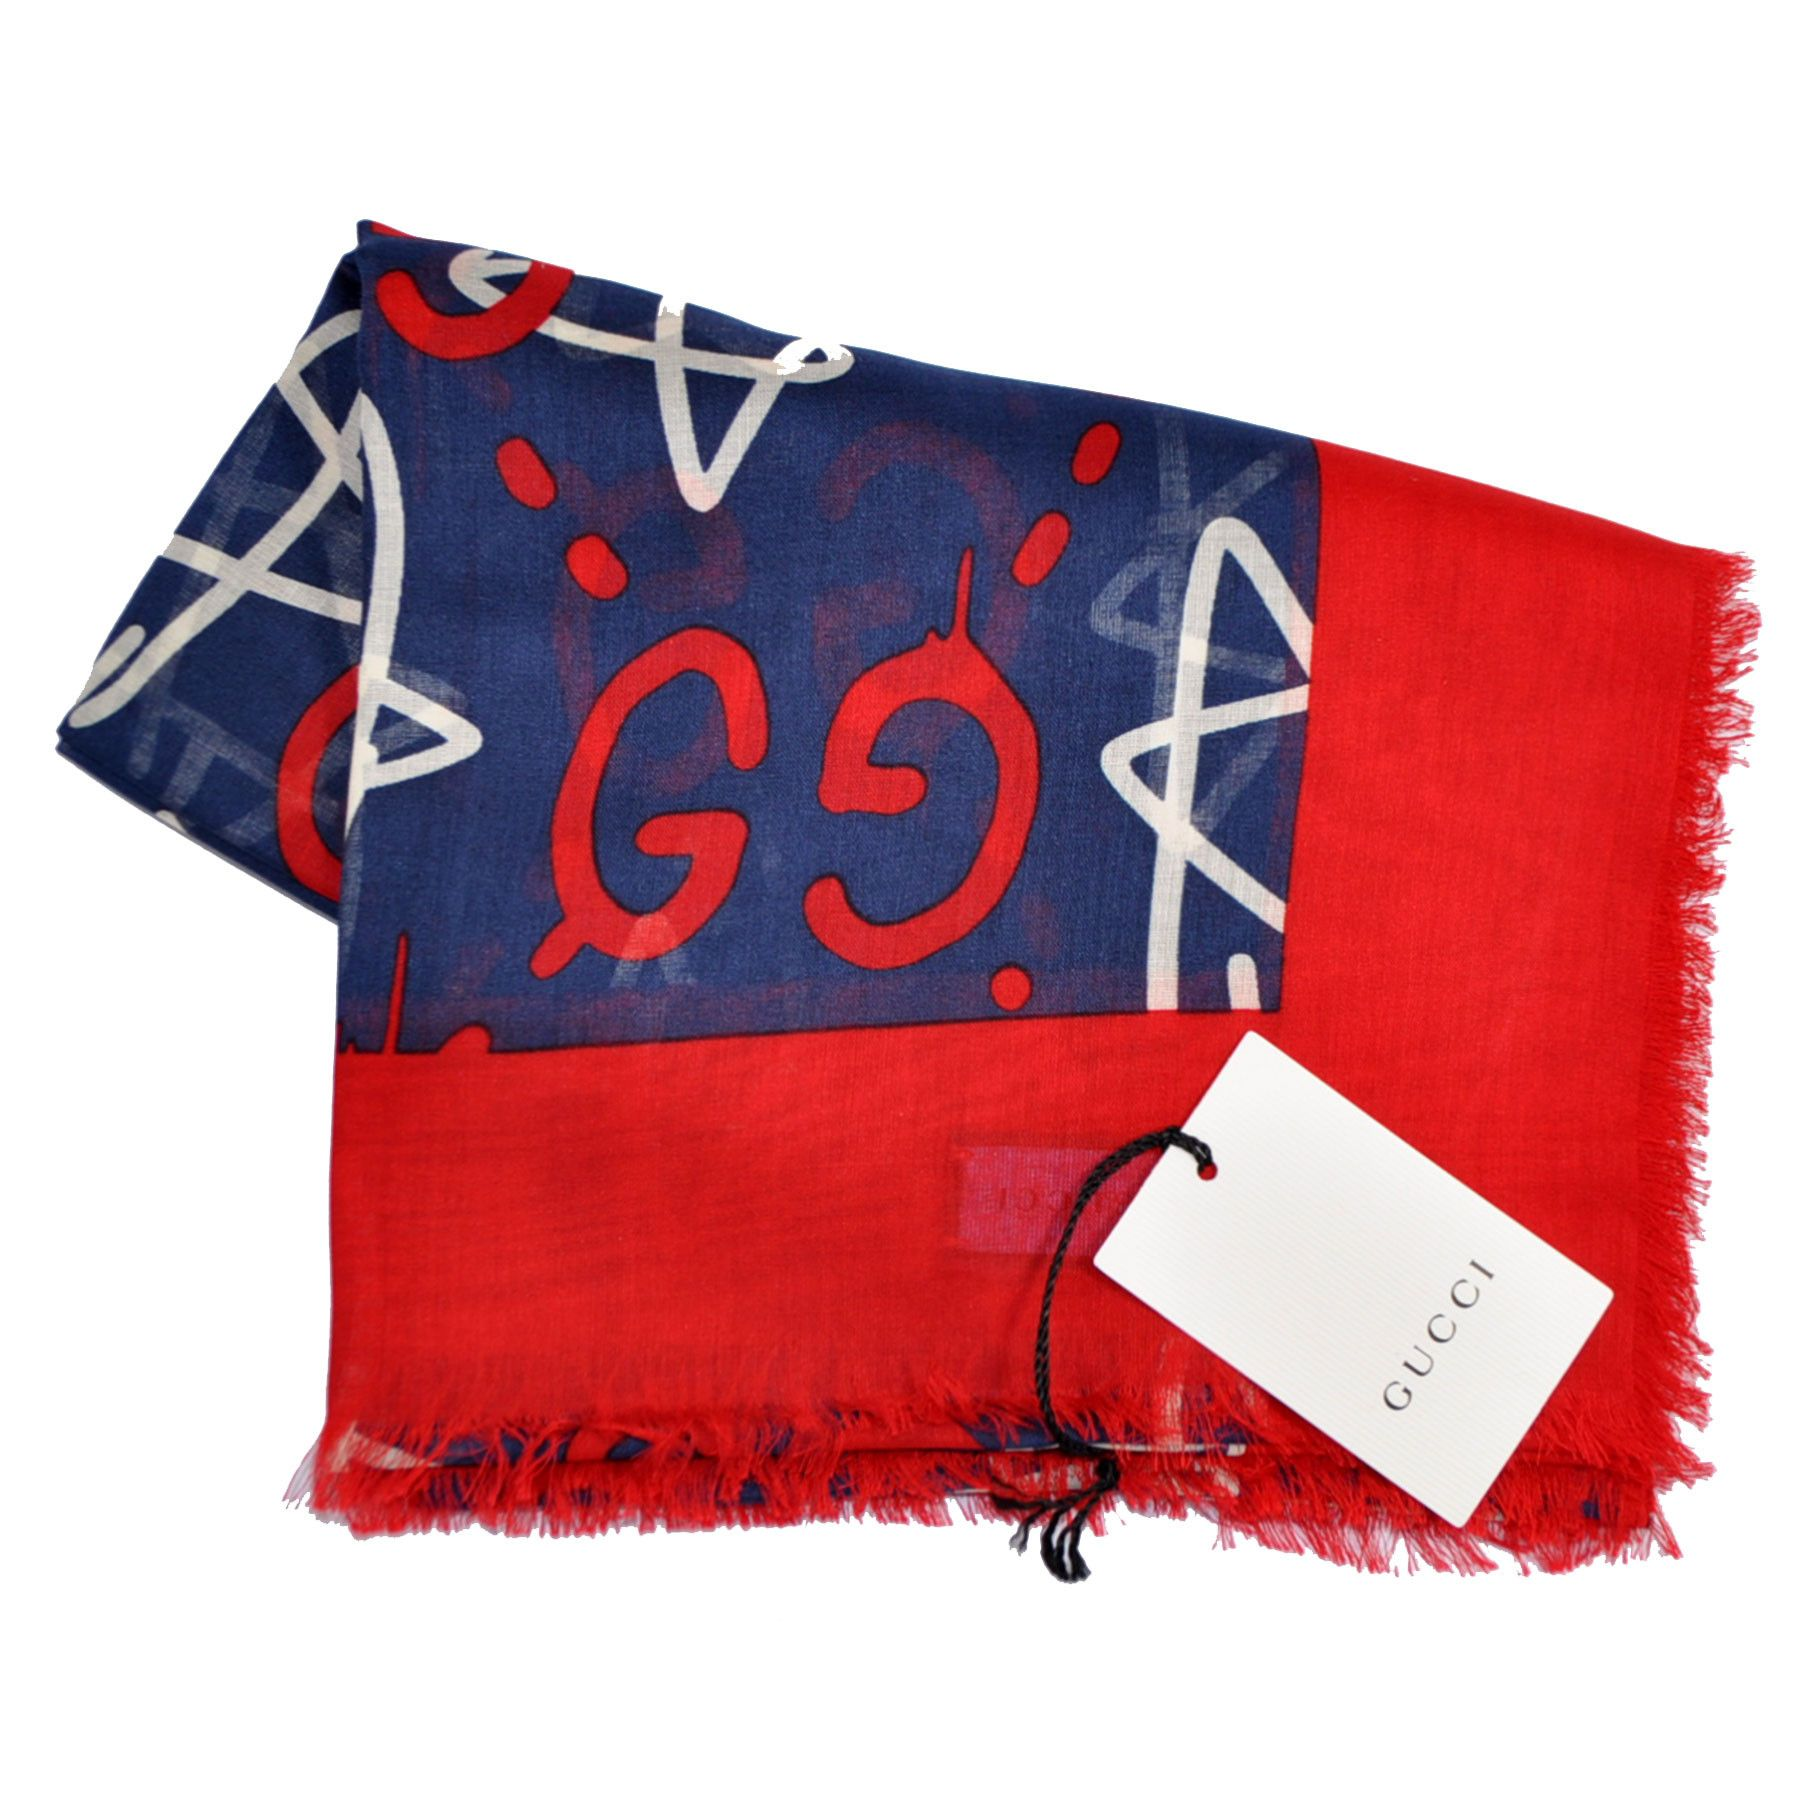 gucci scarf guccighost design navy red gg modal silk